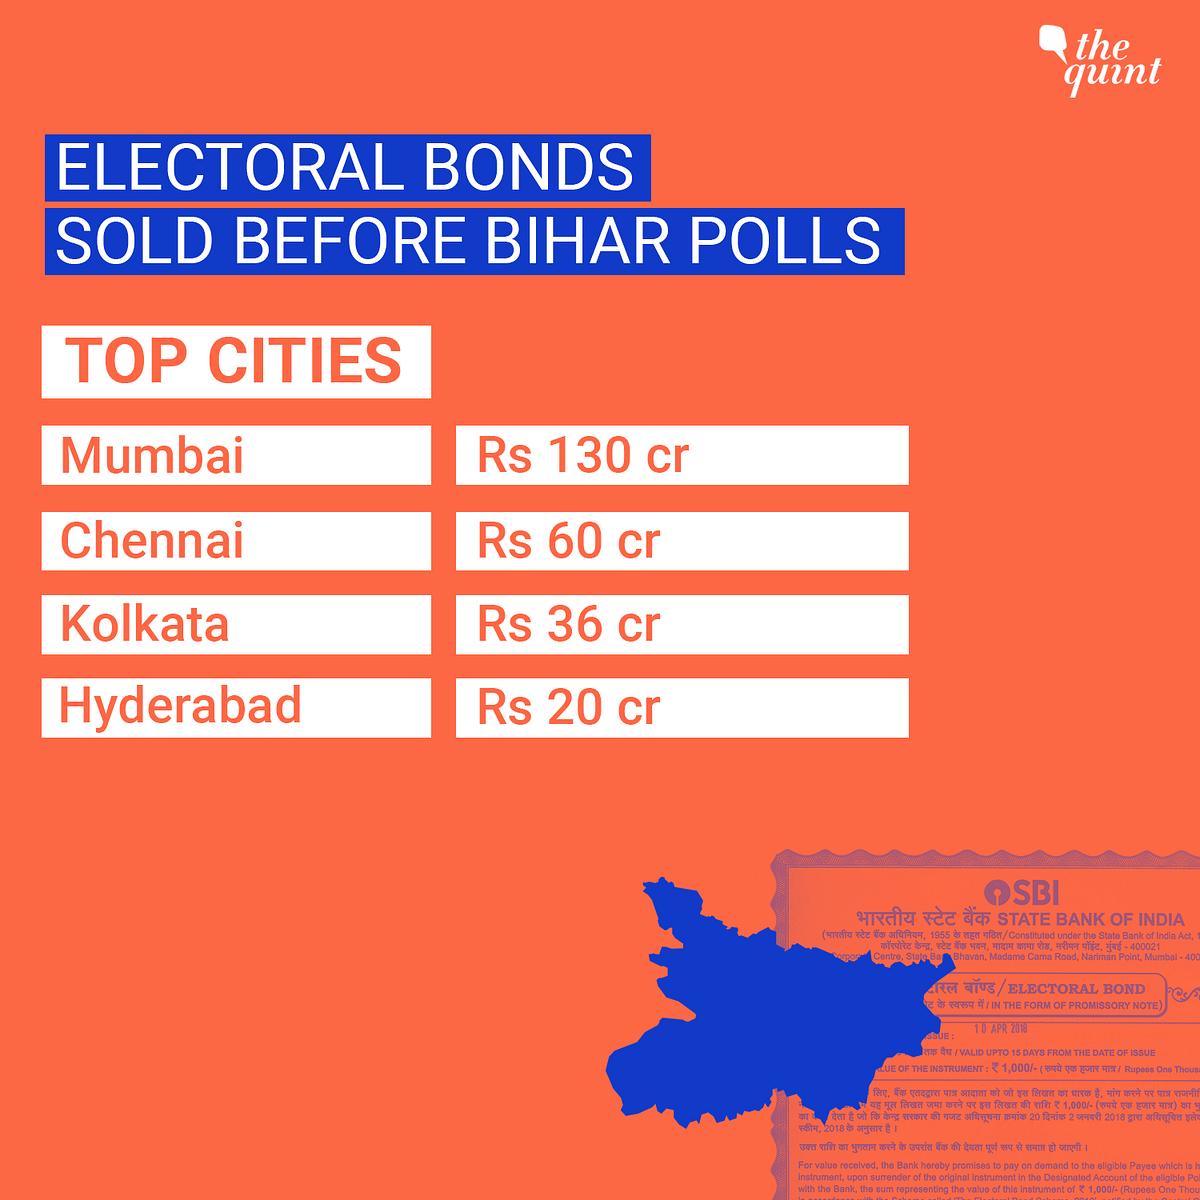 Bihar Polls: Electoral Bonds Worth 282Cr Sold, Under 1Cr in Bihar!